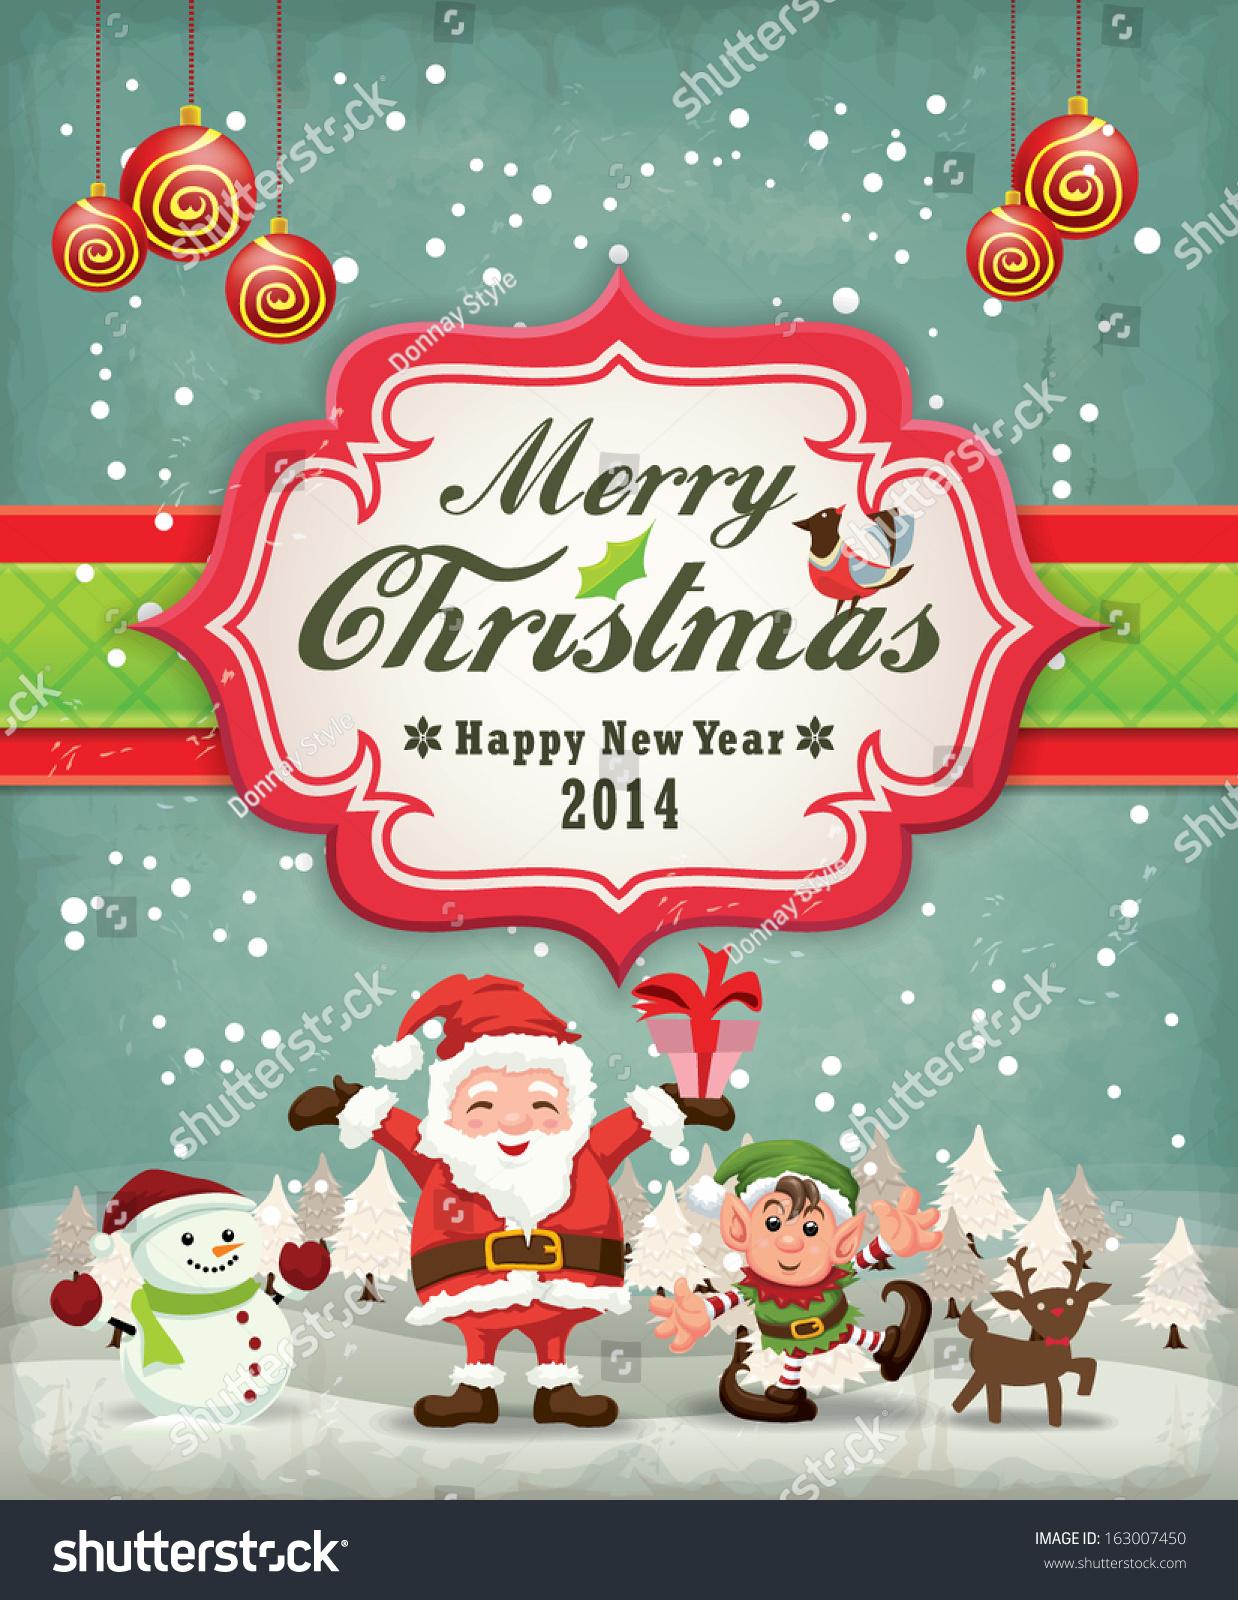 Xmas poster design - Vintage Christmas Poster Design With Santa Claus